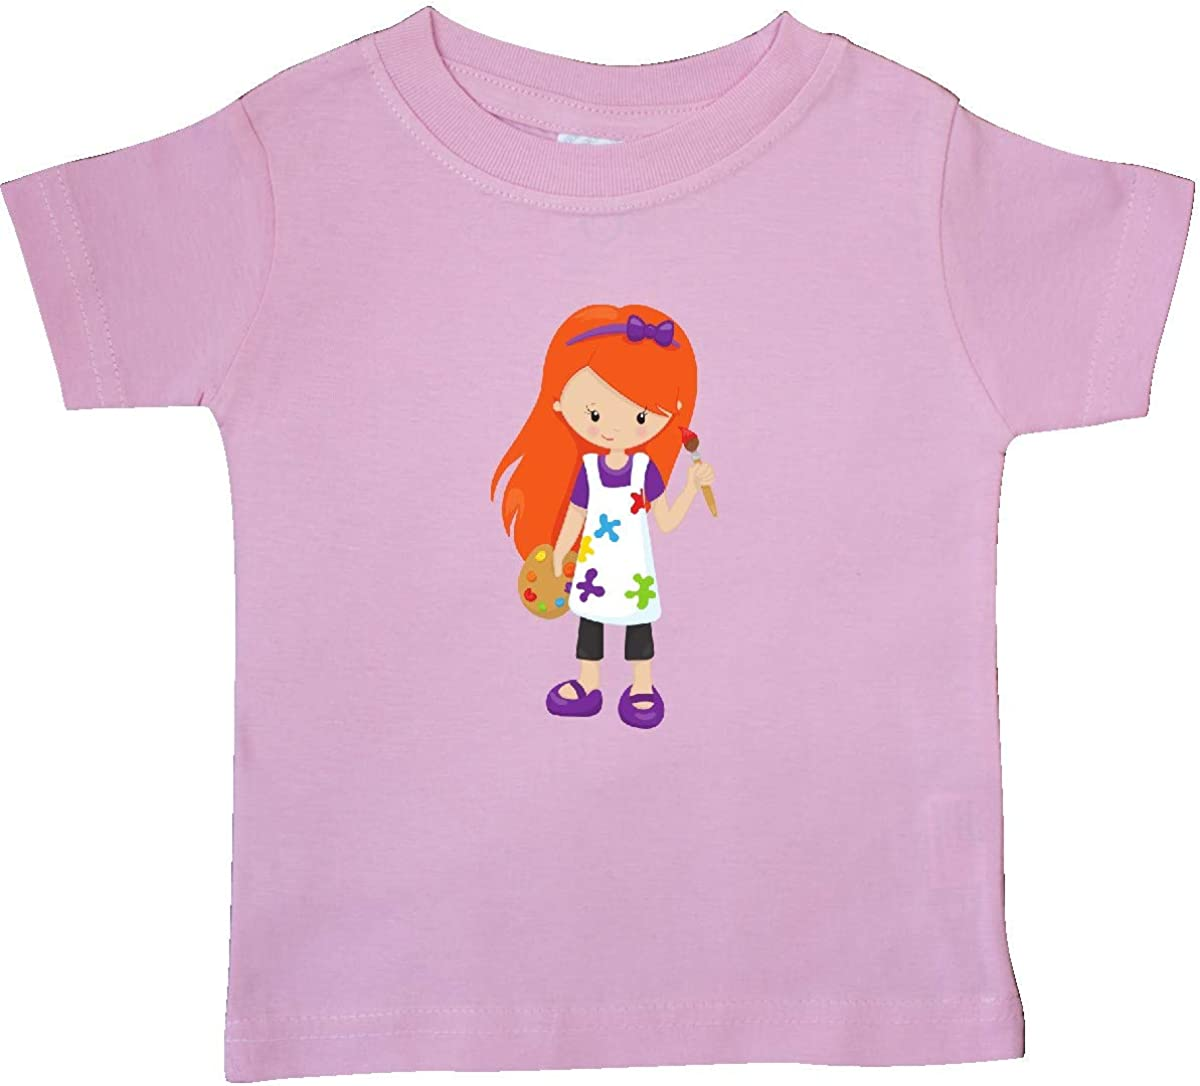 Paint Artist Baby T-Shirt inktastic Cute Girl Orange Hair Painter